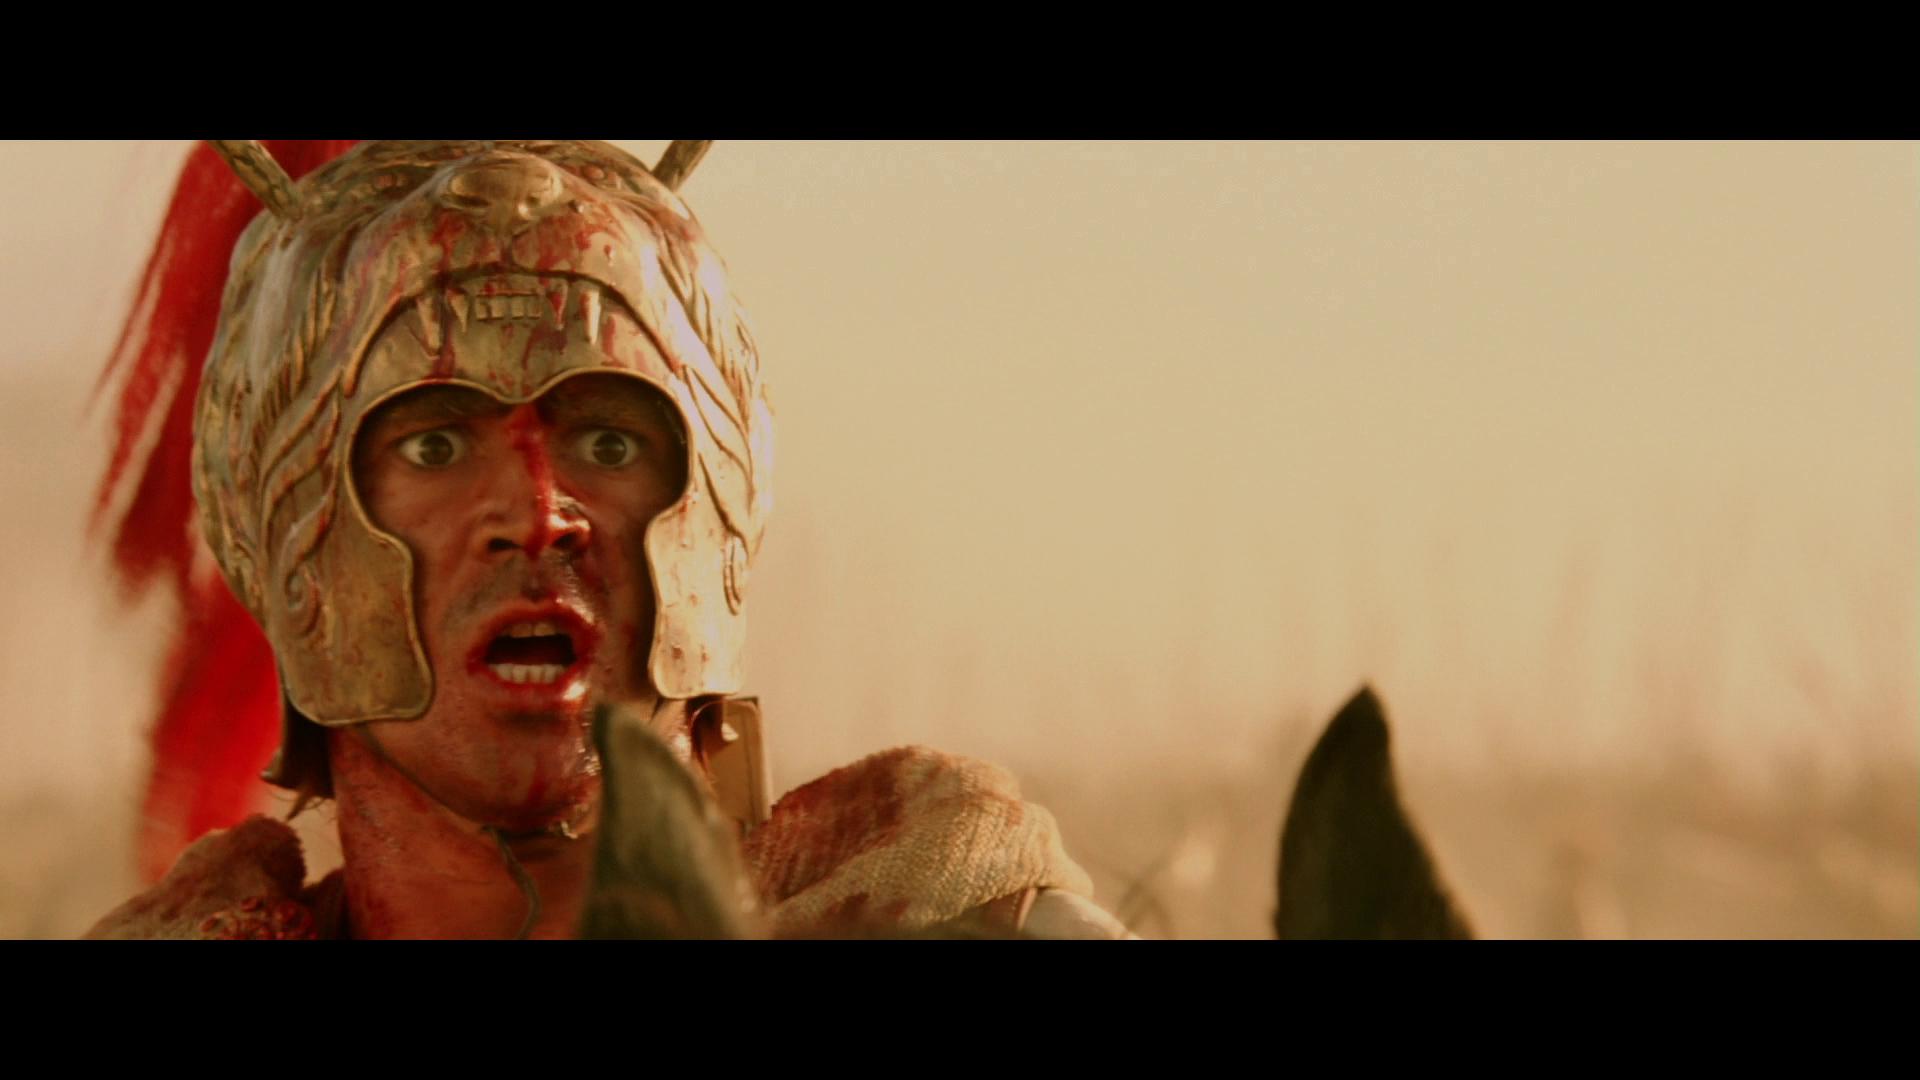 Great Alexander Film - HD Wallpaper